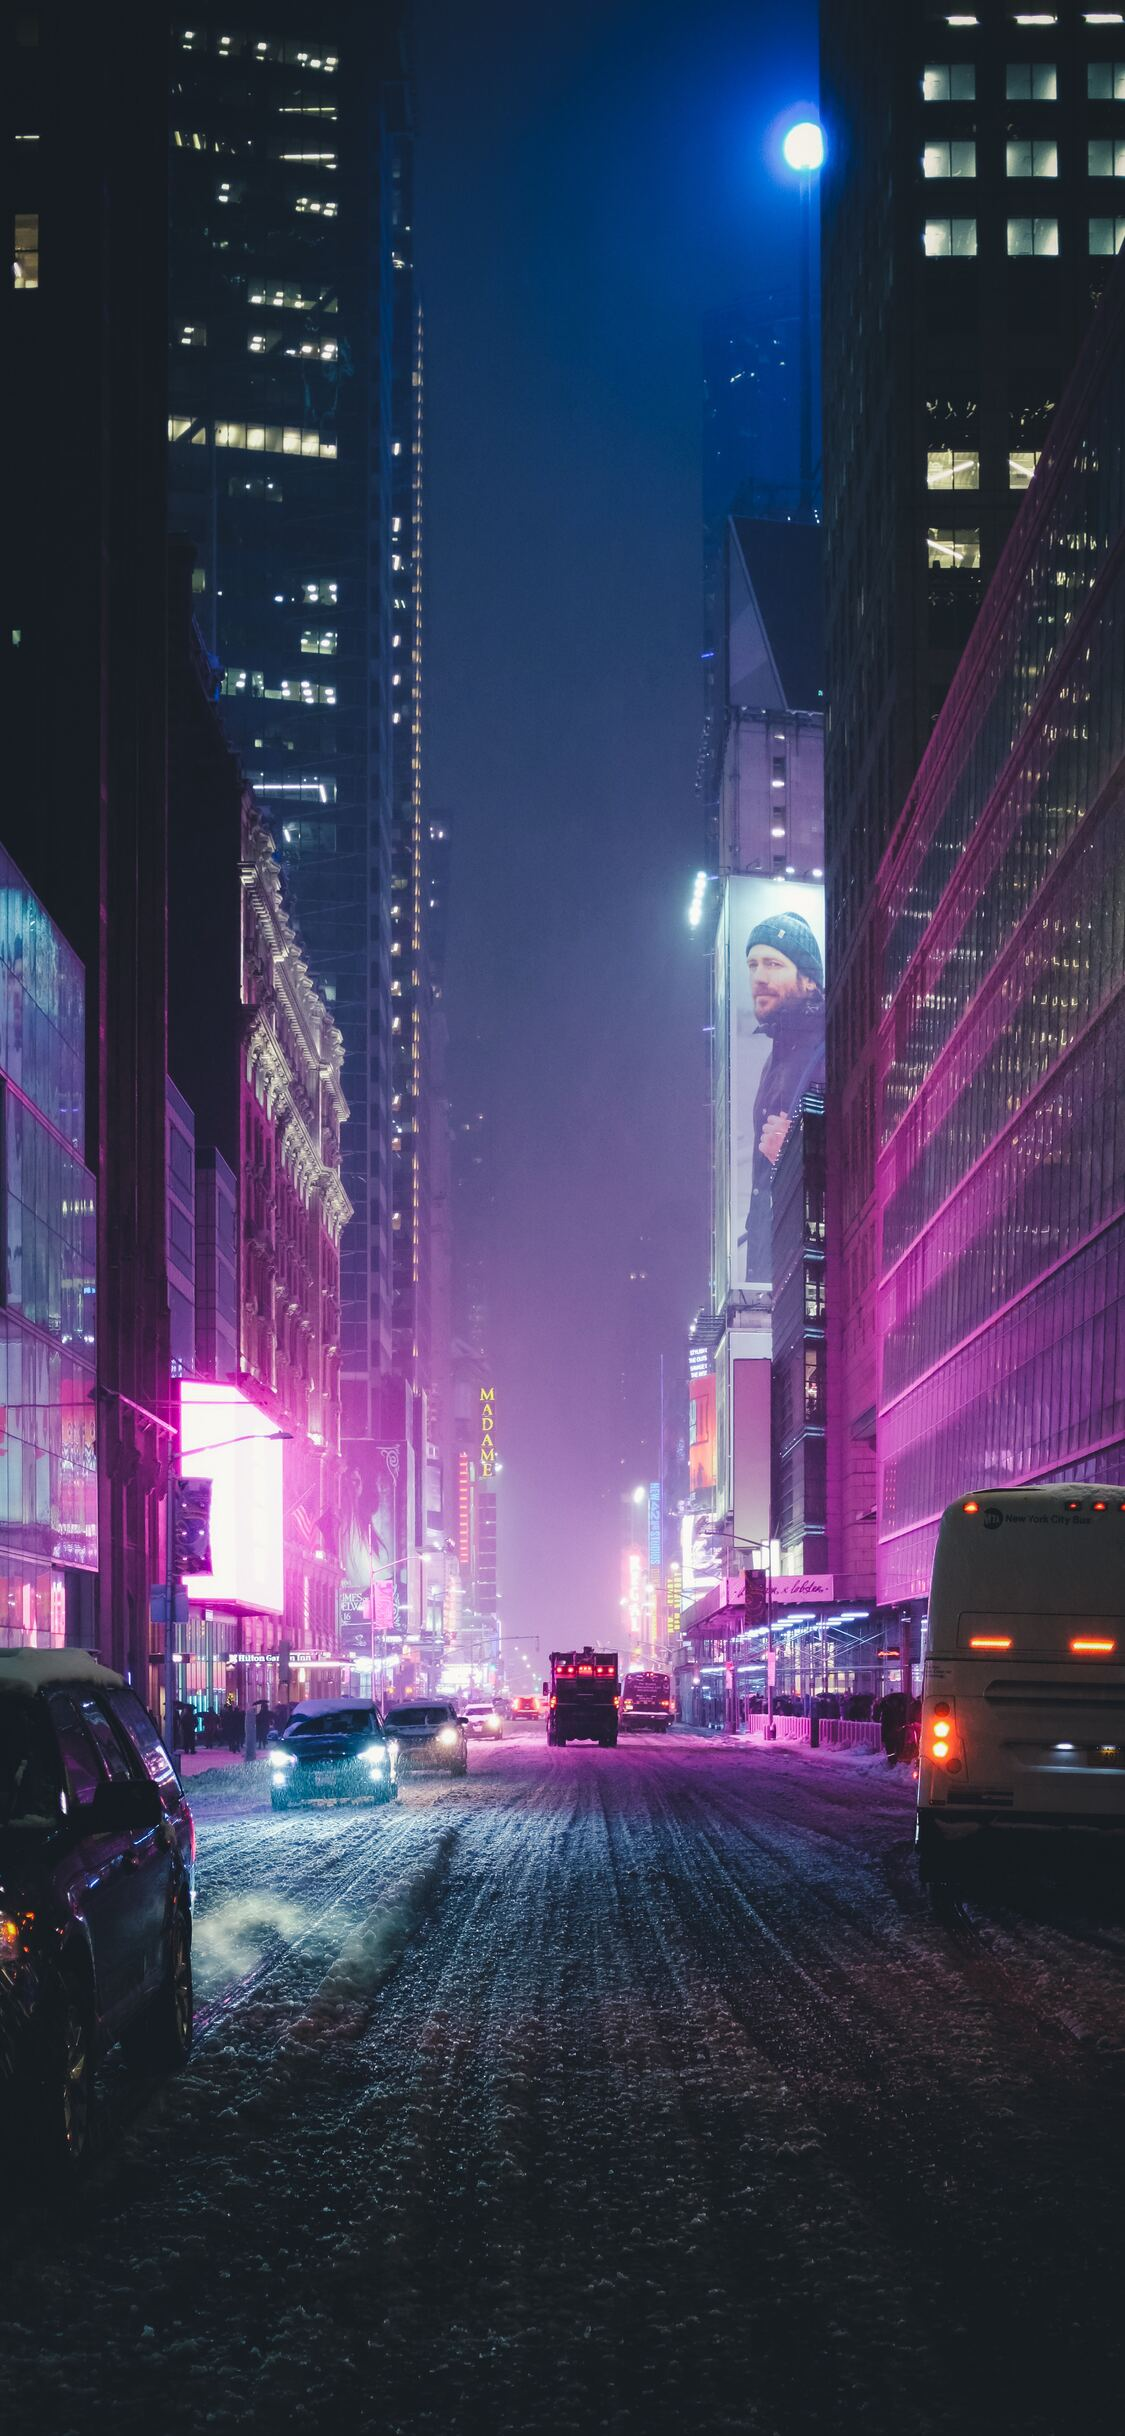 1125x2436 Night City Street Neon Lights 4k Iphone Xs Iphone